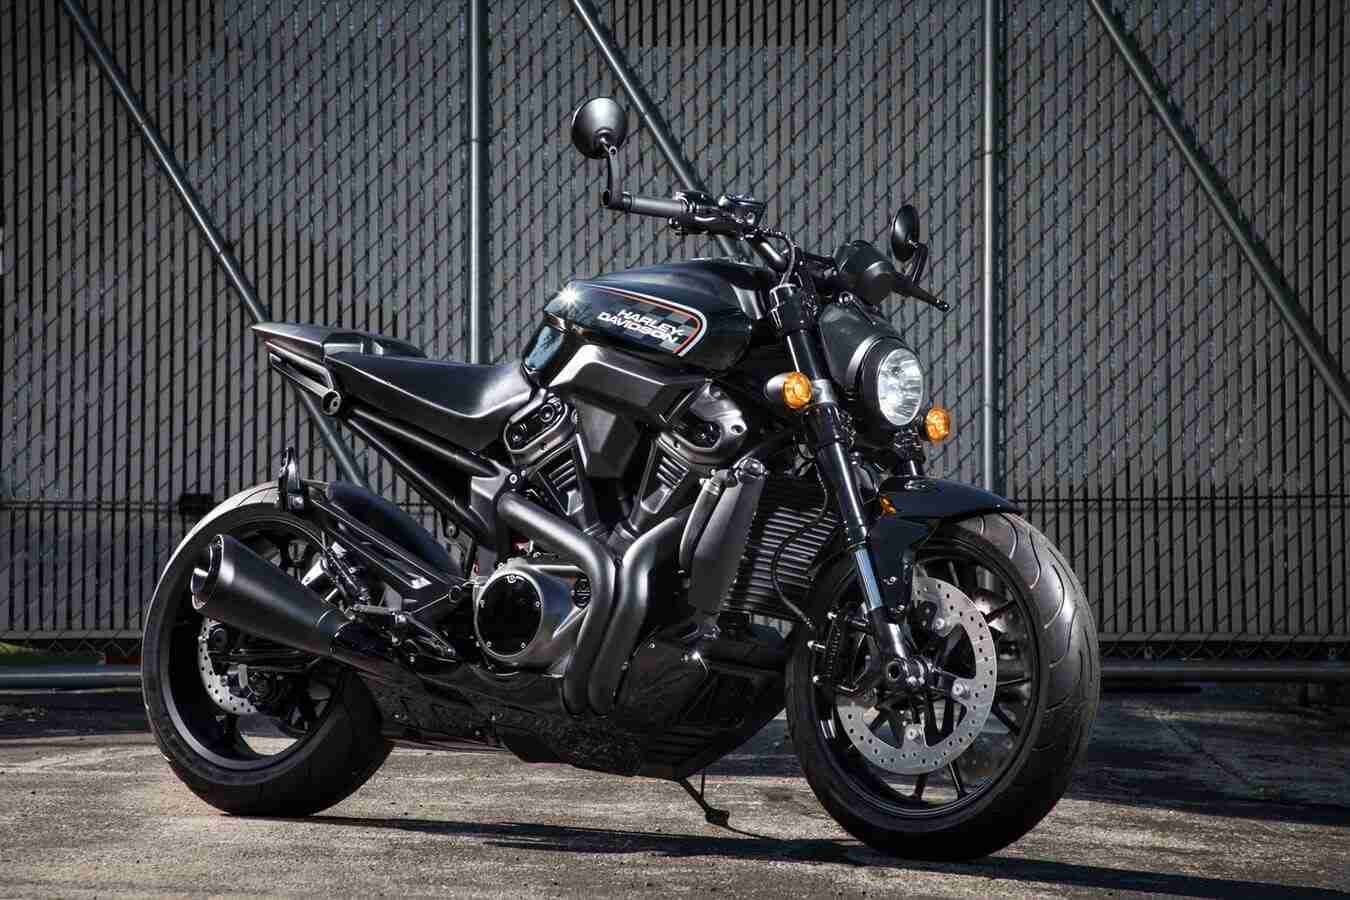 Best Motor Oil For Harley Davidson: The Definitive Guide 2020